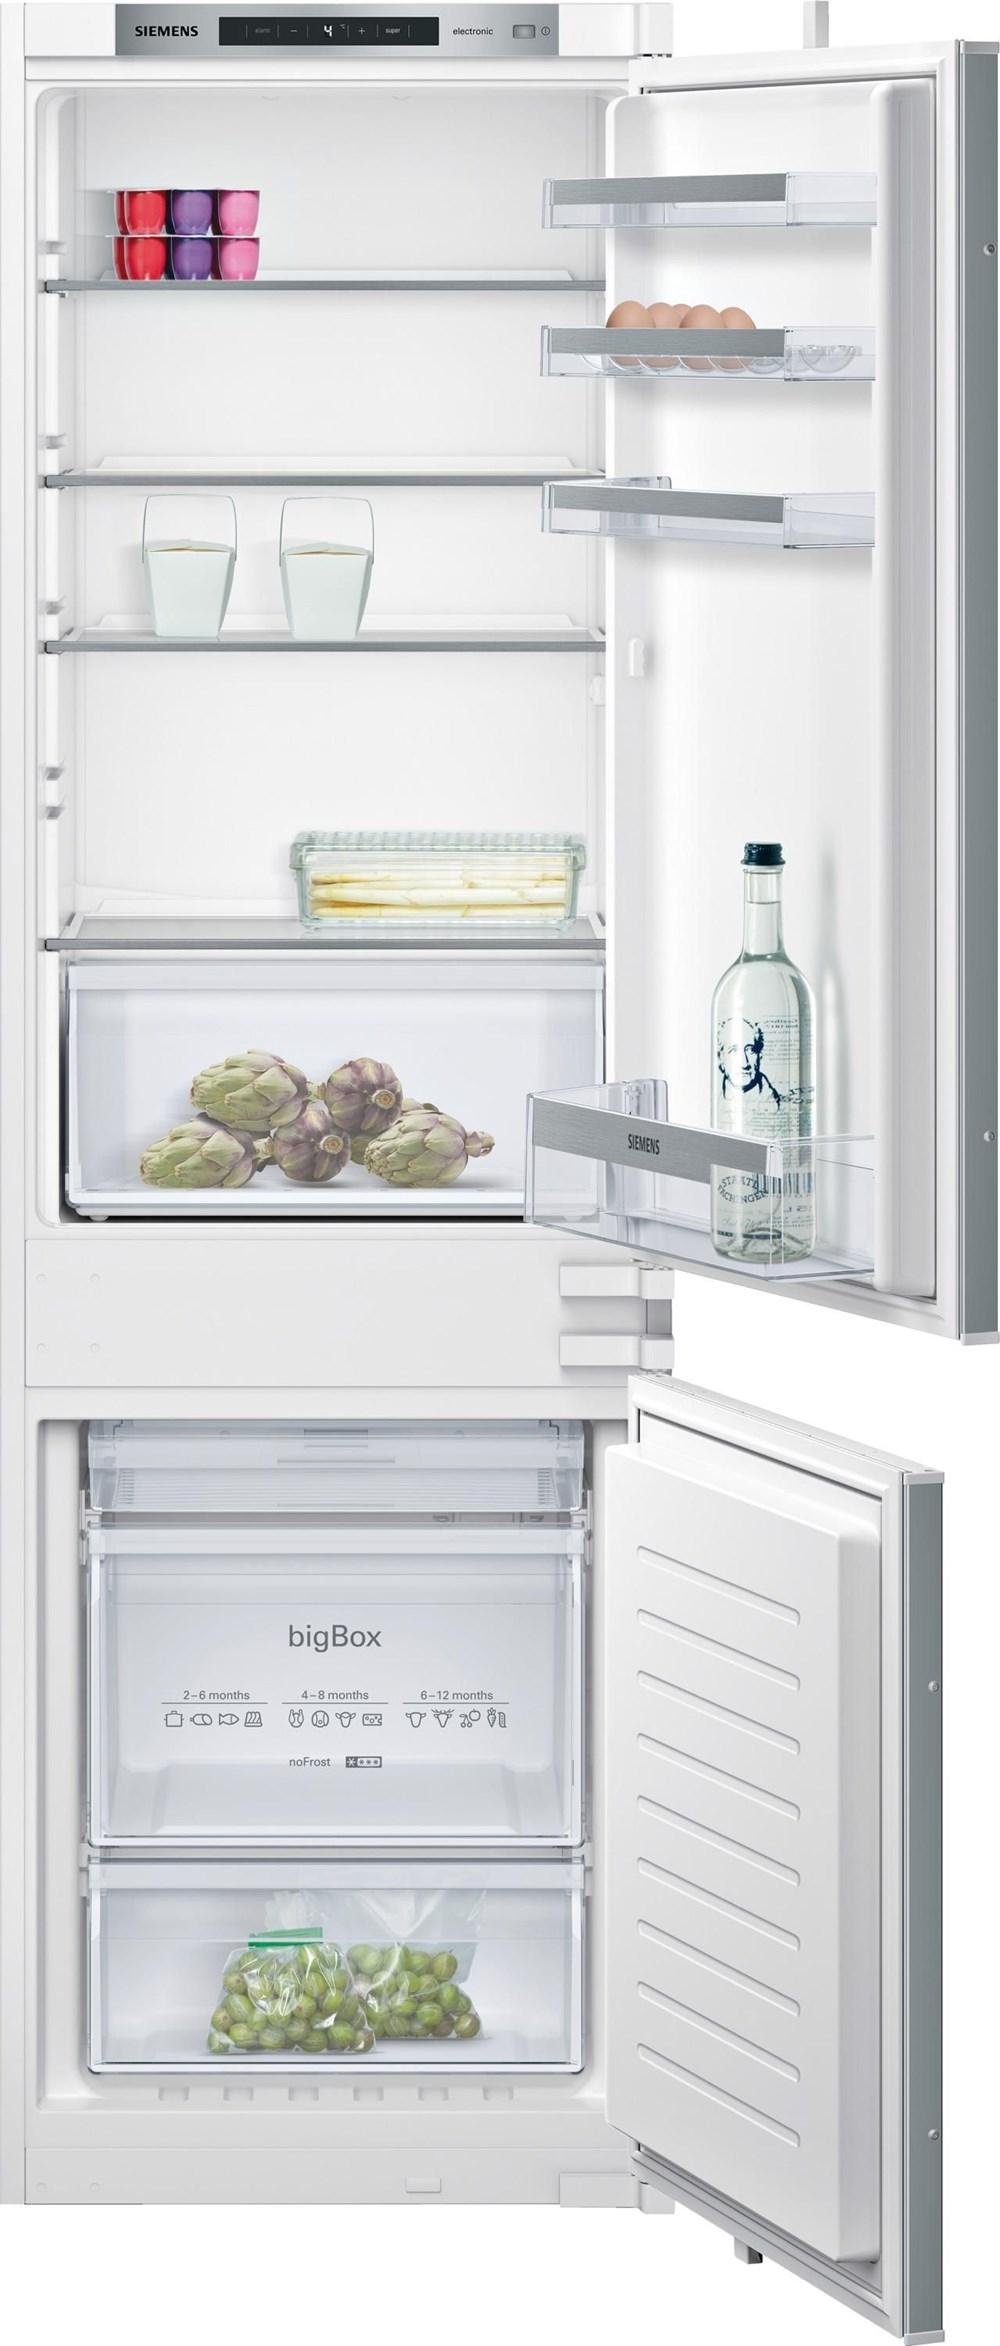 siemens ki86nvs30 einbau k hl gefrierkombination no frost built in fridge freezers. Black Bedroom Furniture Sets. Home Design Ideas